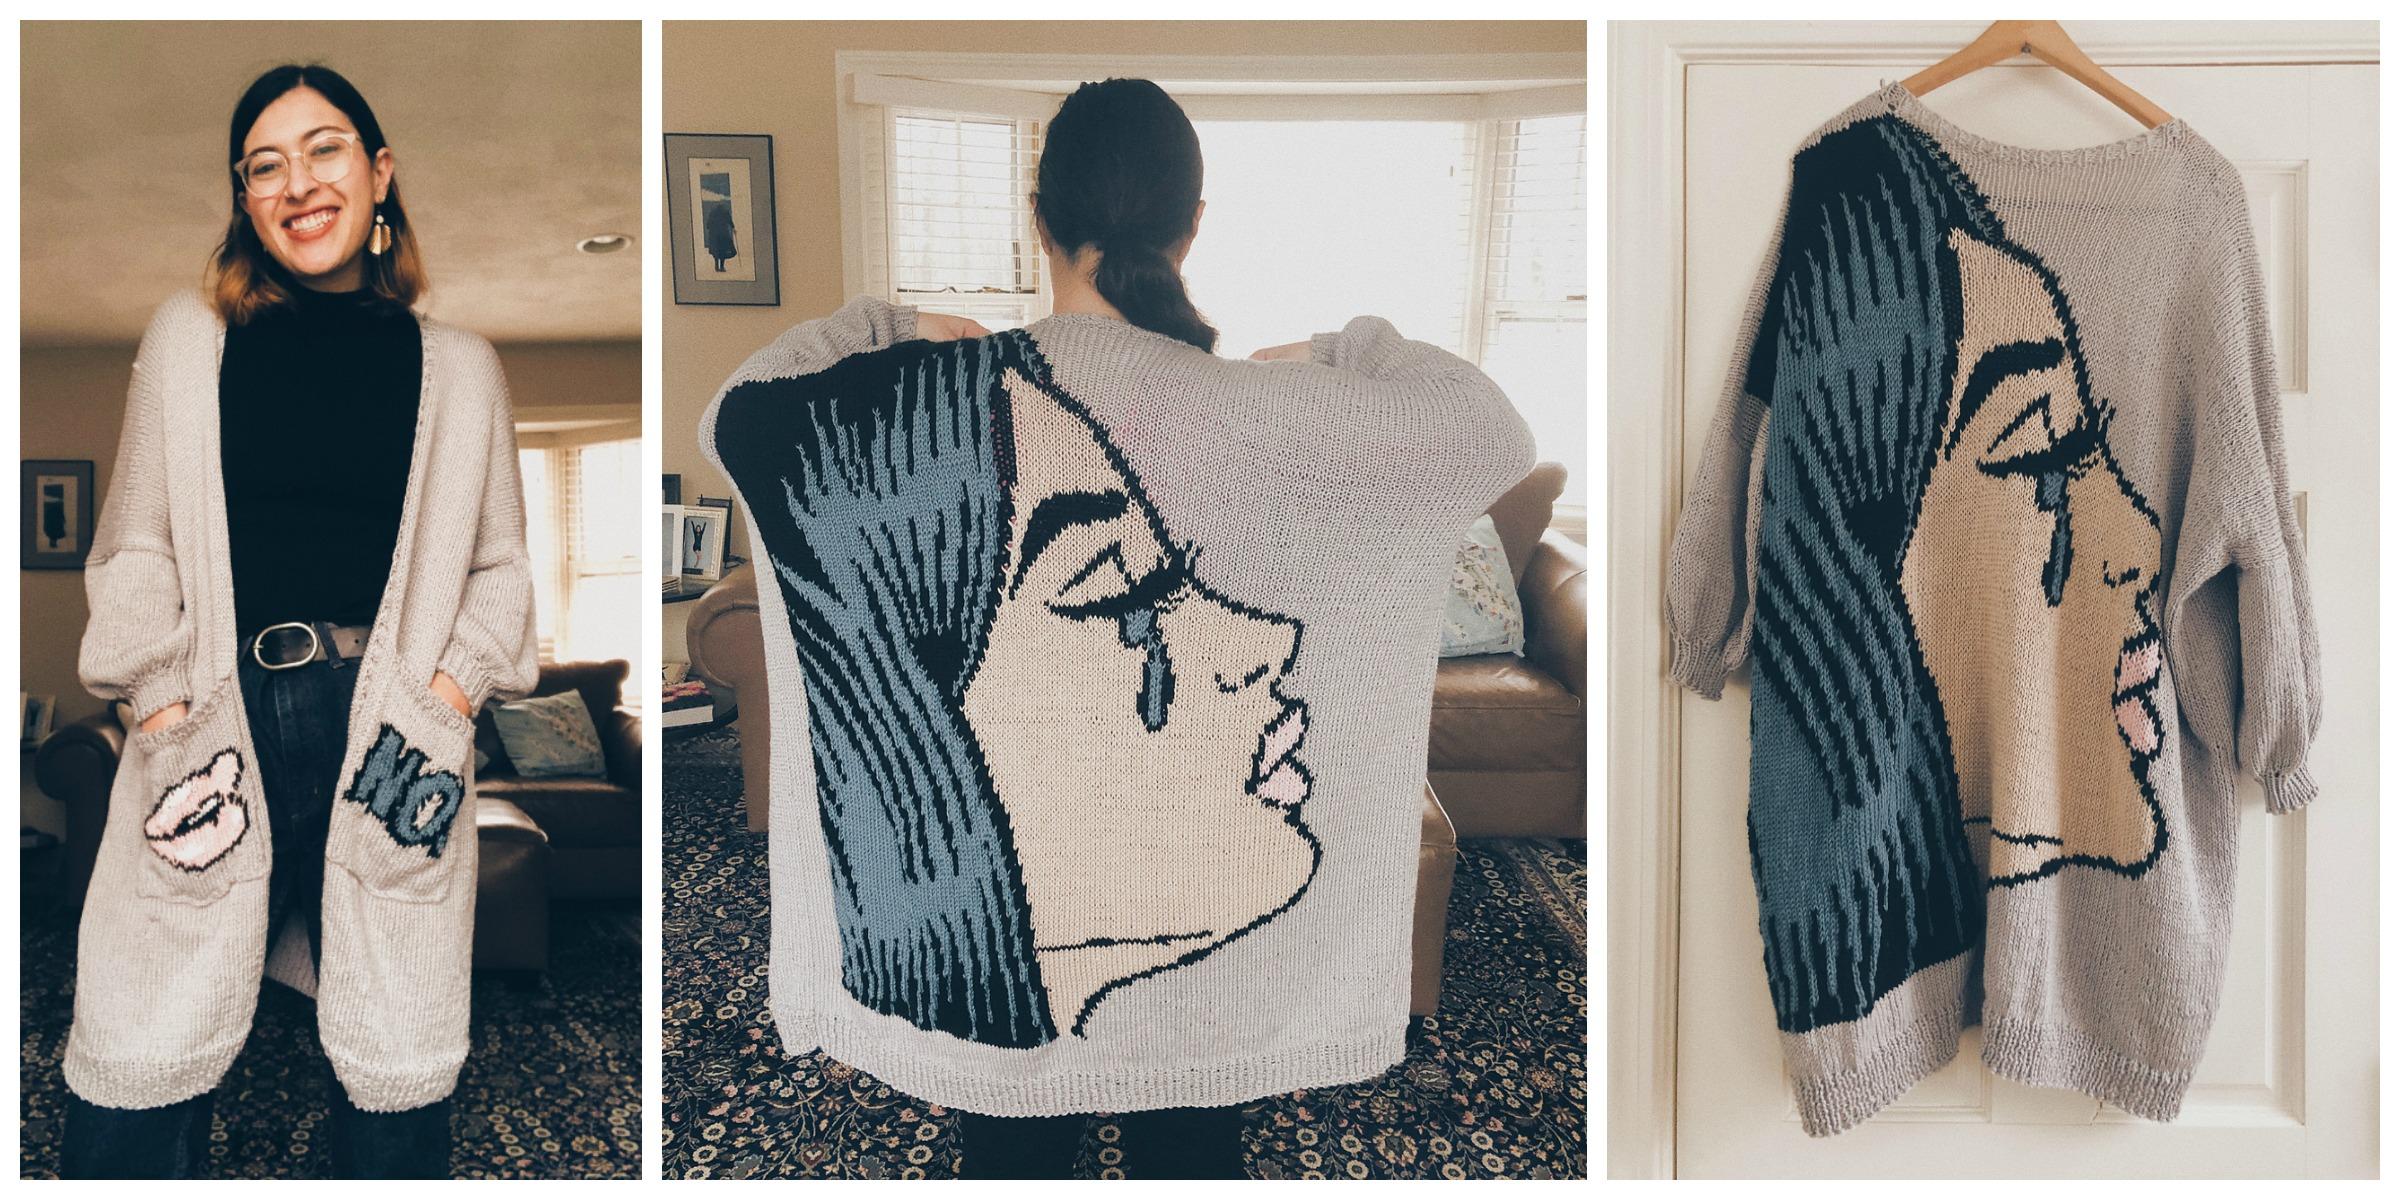 Gorgeous Pop Art Upgrade To Free Uptown Cardigan Pattern